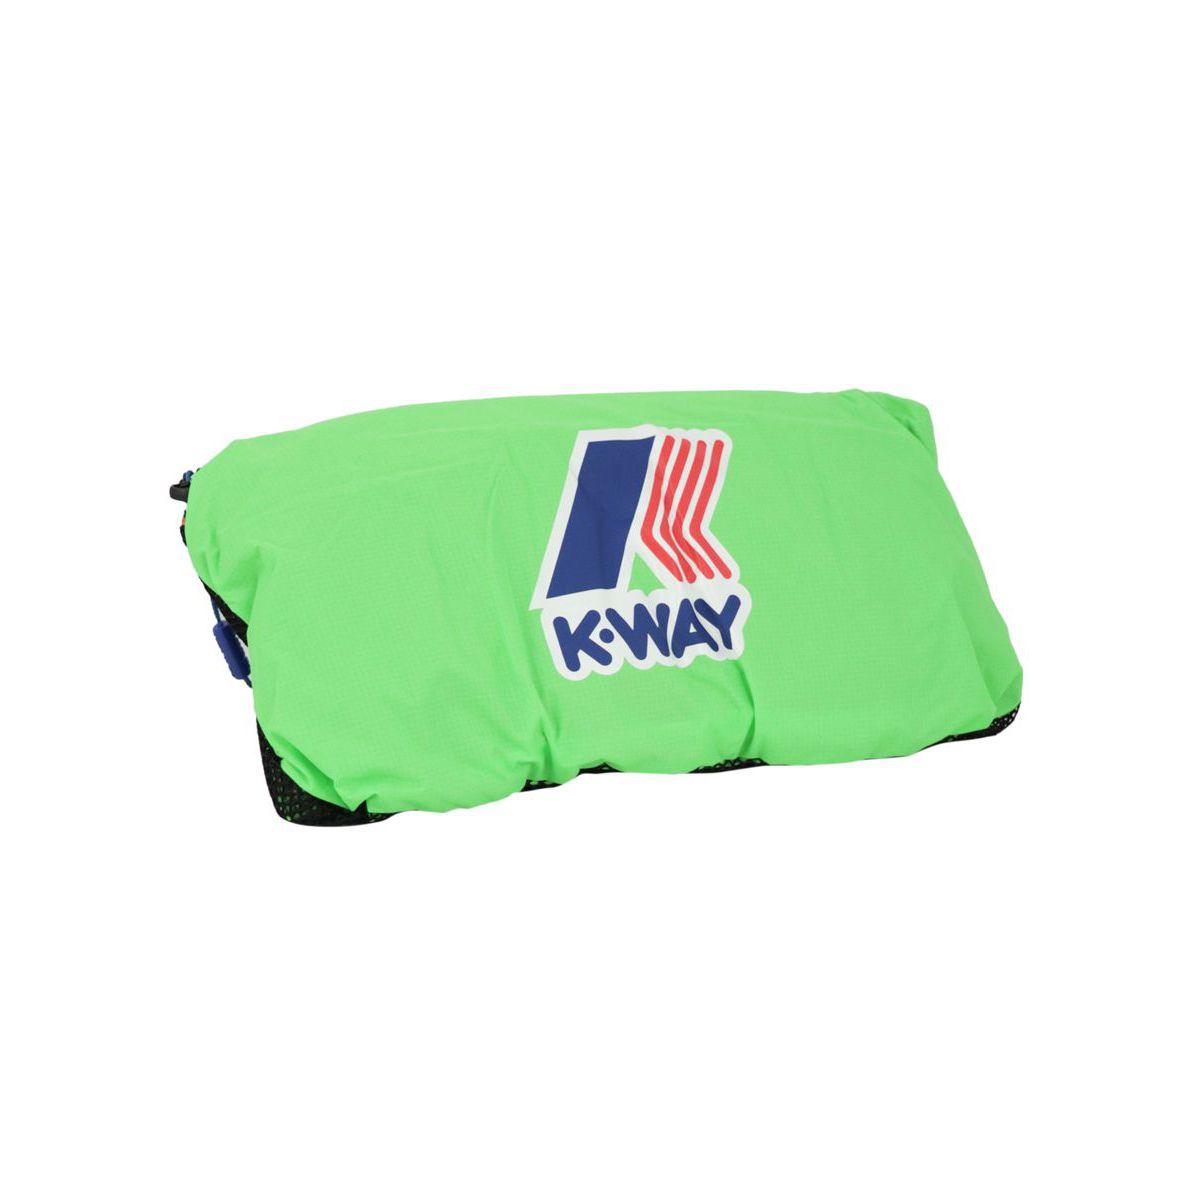 Le Vrai 3.0 Francois backpack Green K-Way